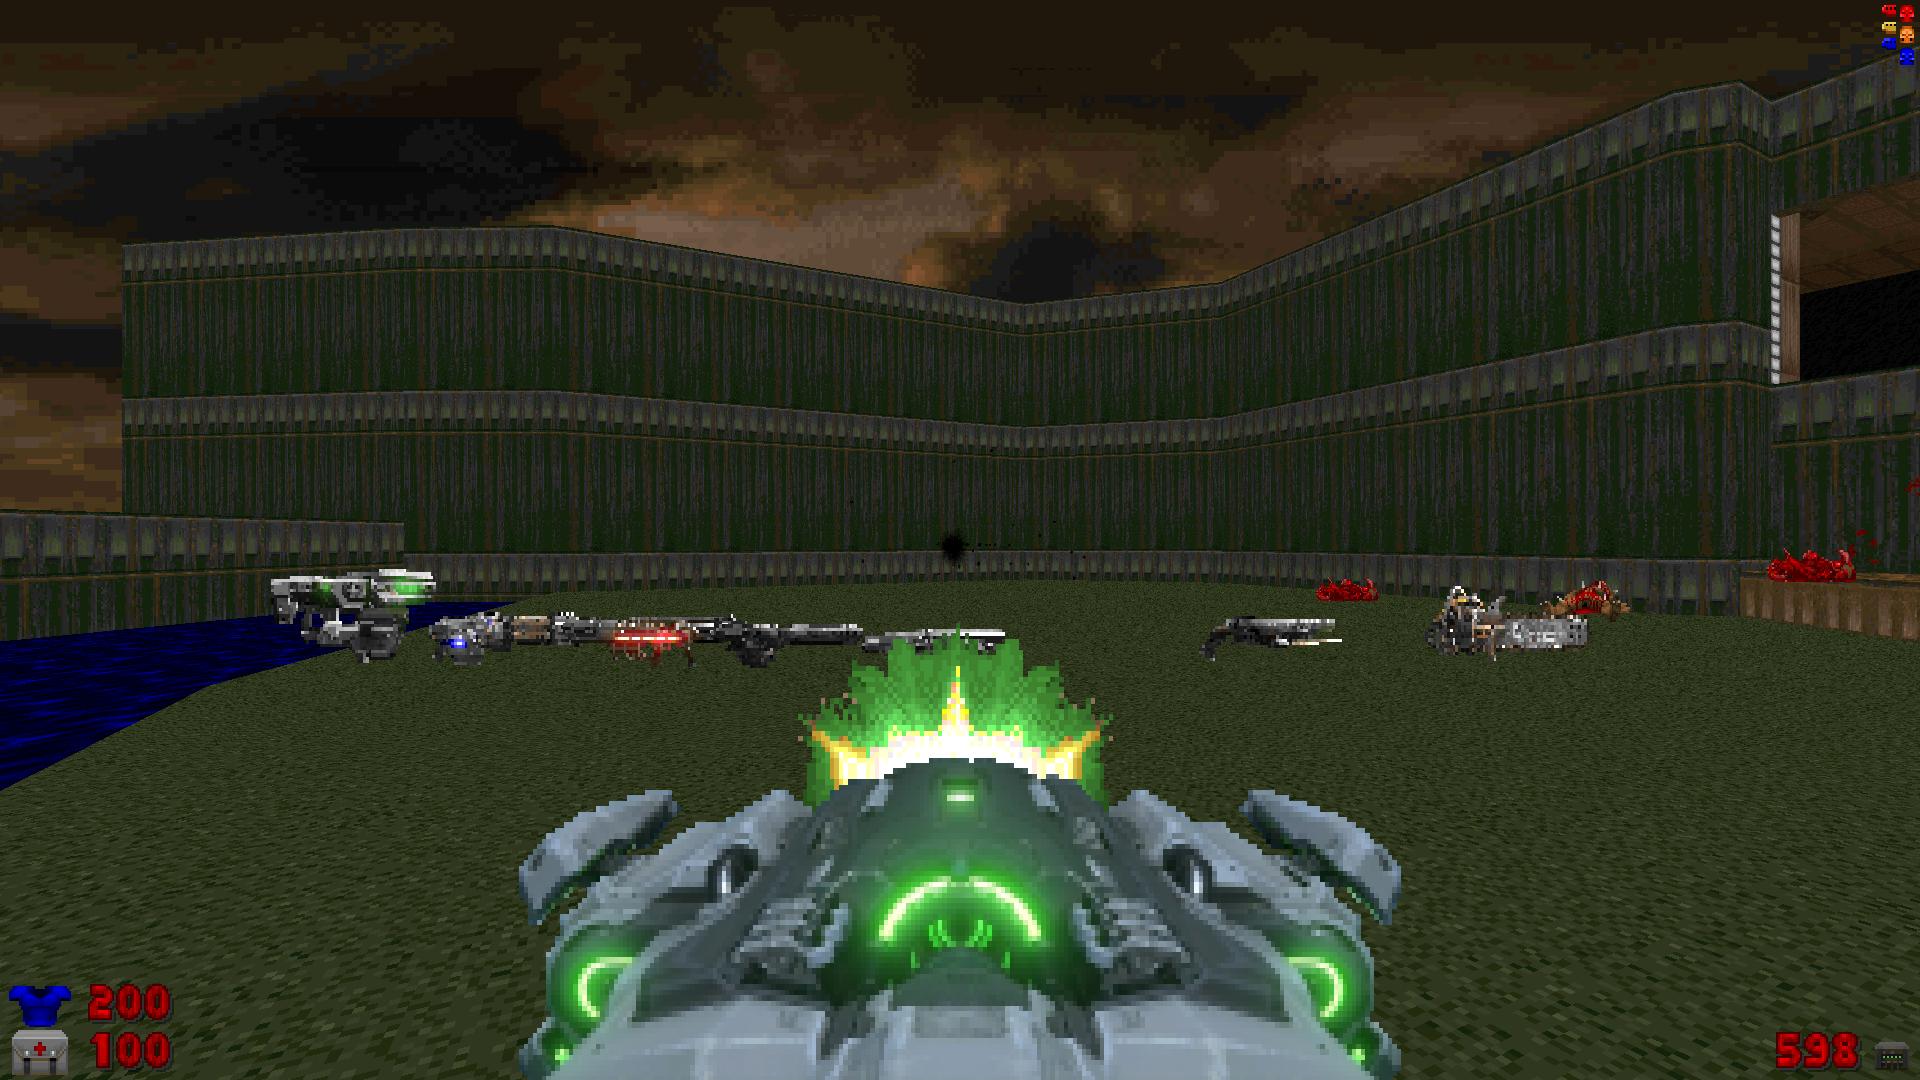 Screenshot_Doom_20200409_180545.png.8f6a0634a9c1a24c64cf6fc0cf63ce37.png